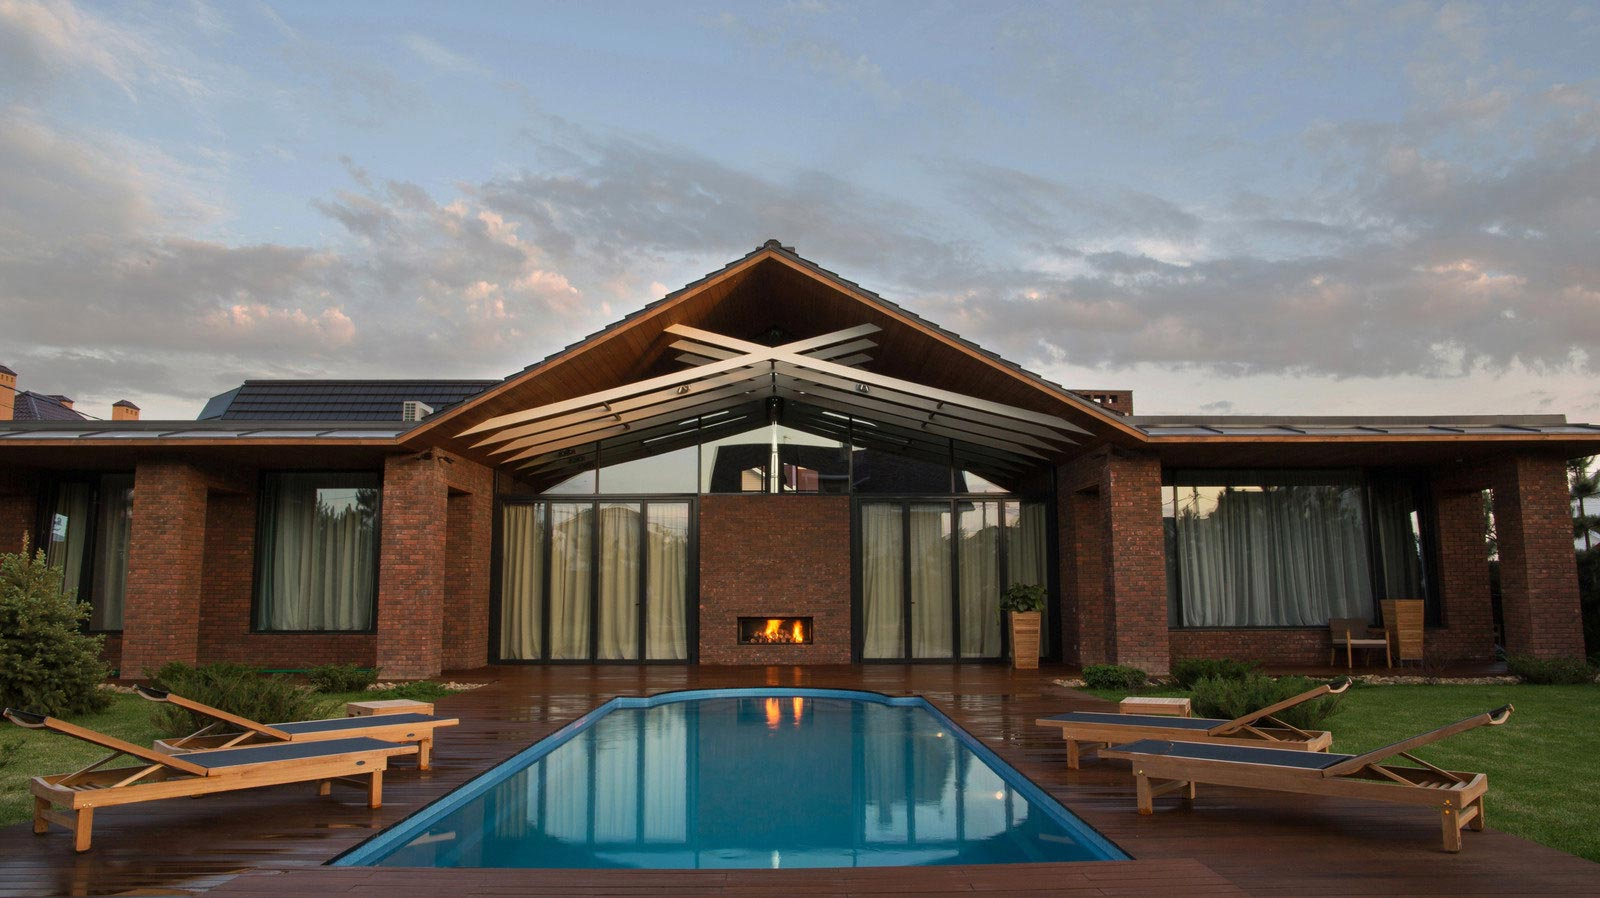 Casa de un piso de 390 metros cuadrados construye hogar for Fachadas de casas de un piso